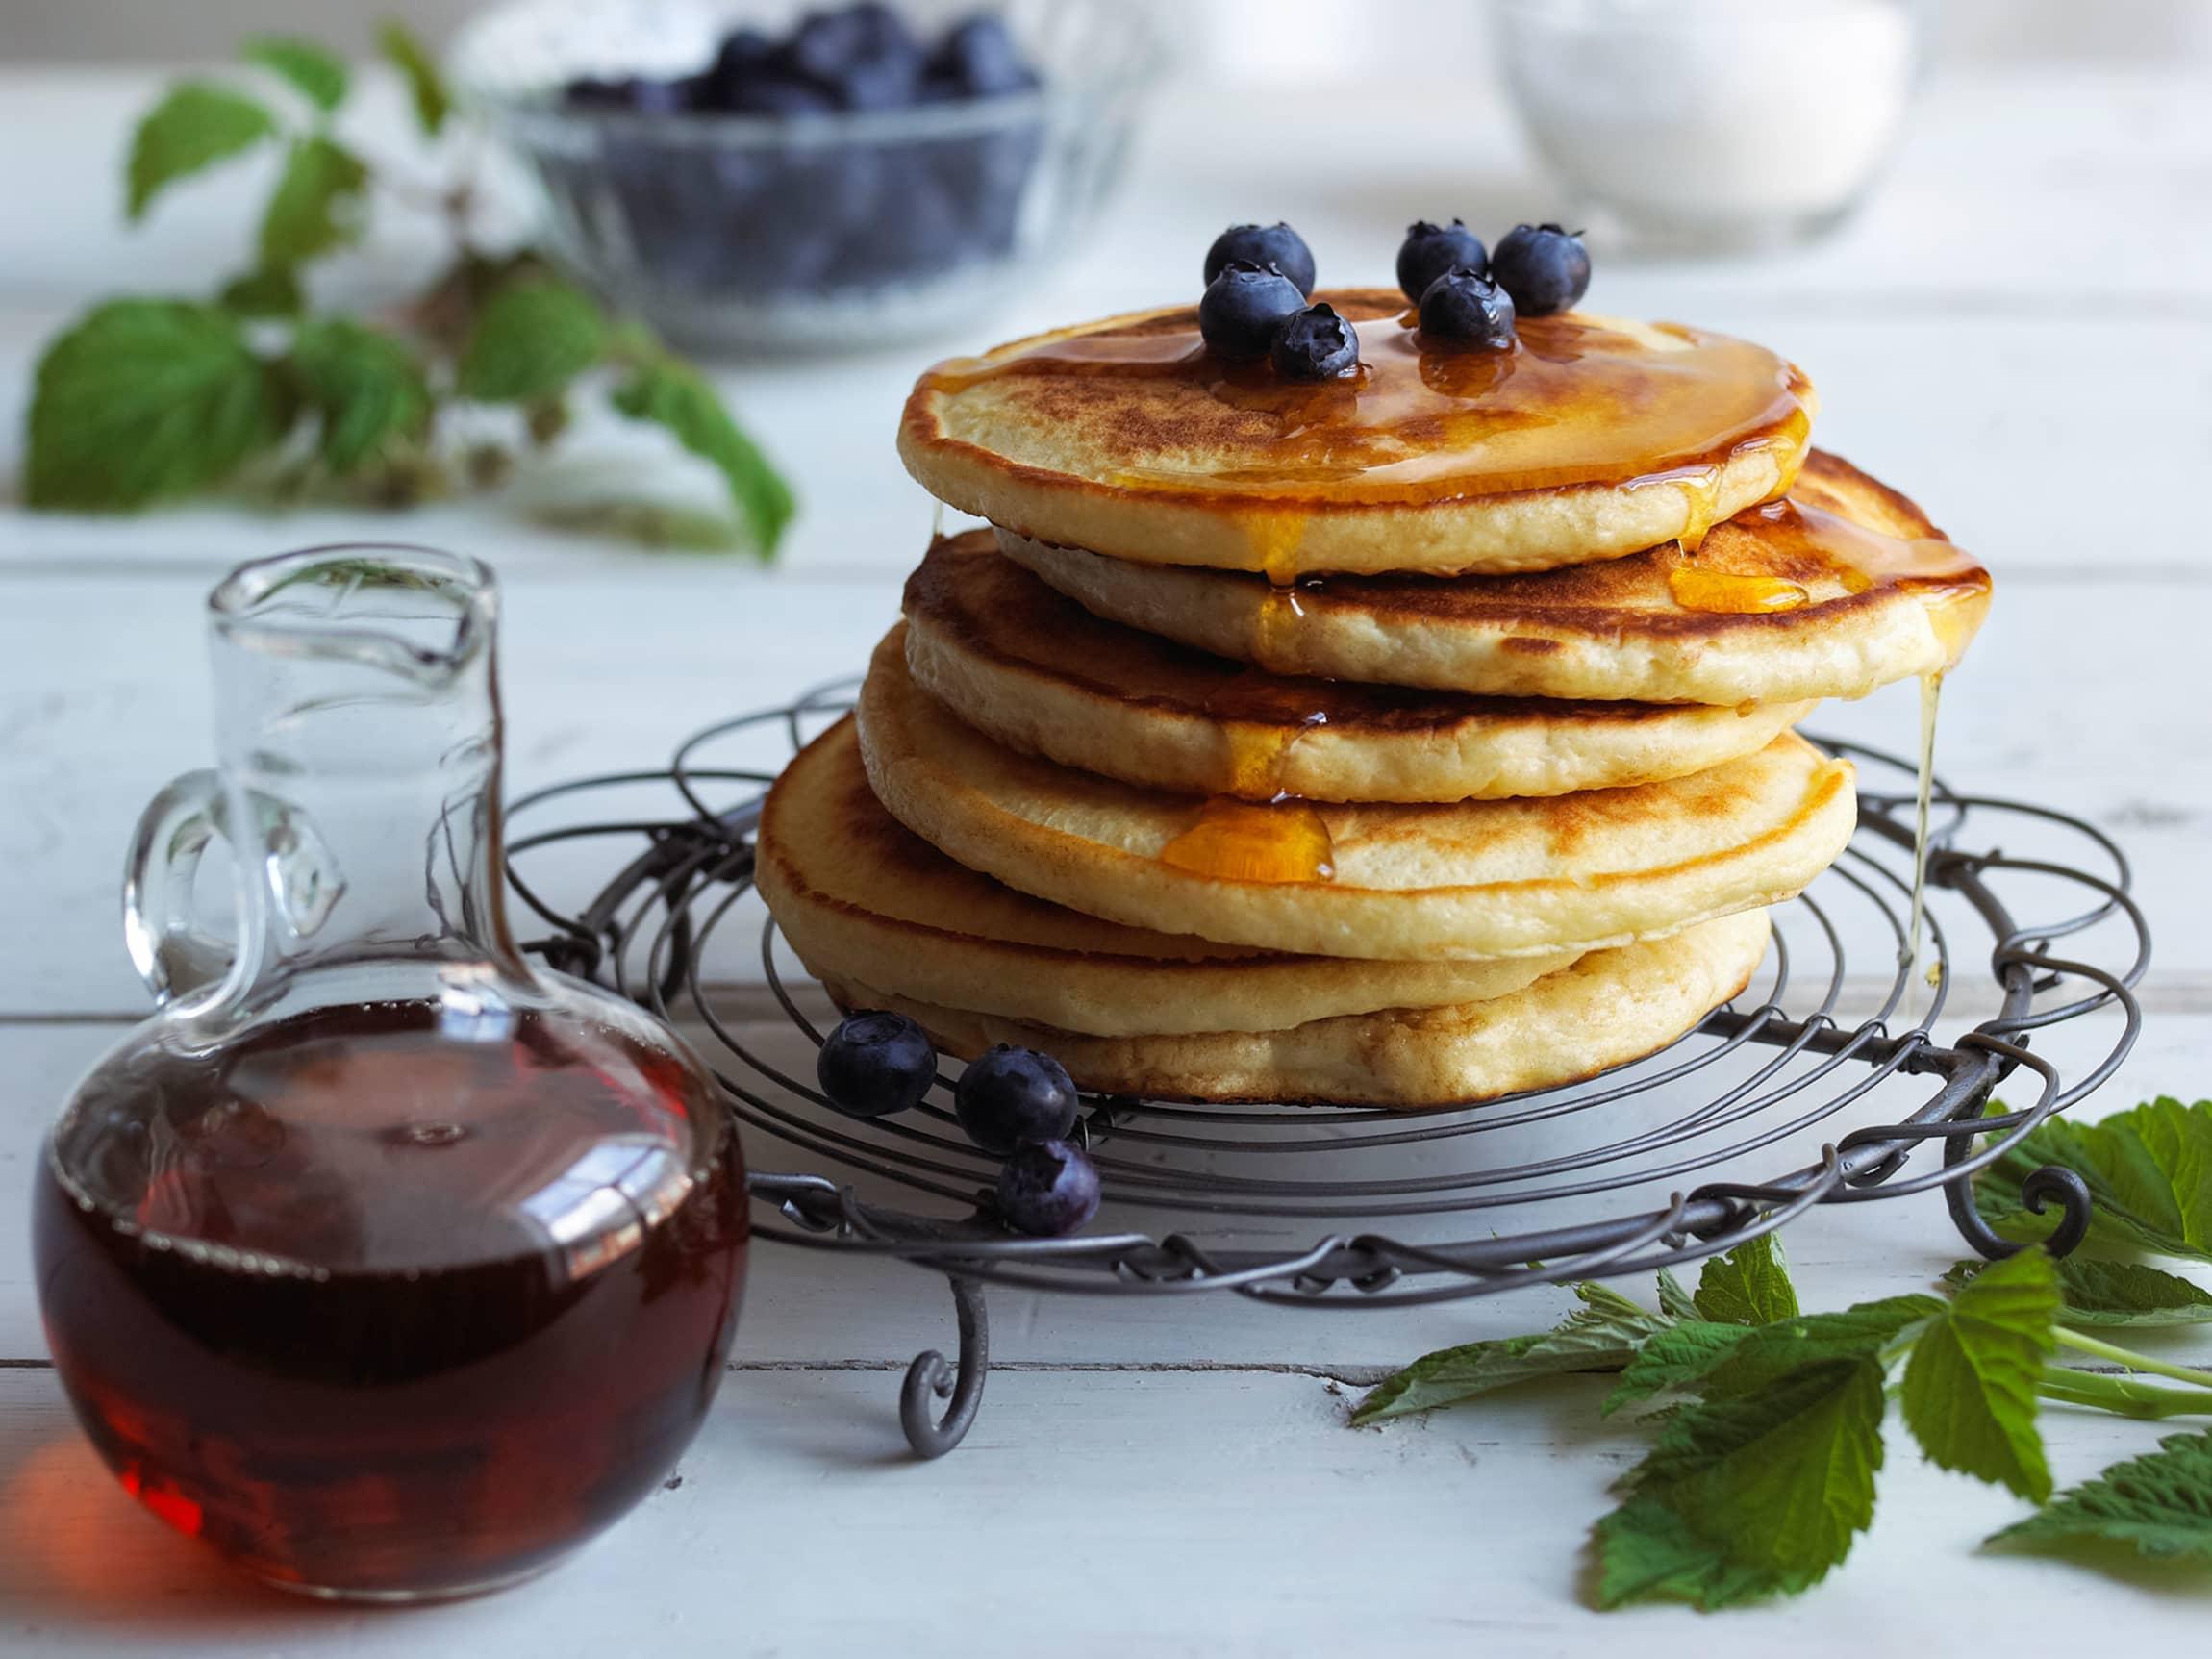 Smakfulle, luftige pannekaker med sirup er et perfekt tilskudd til frokosten på påskeaften.